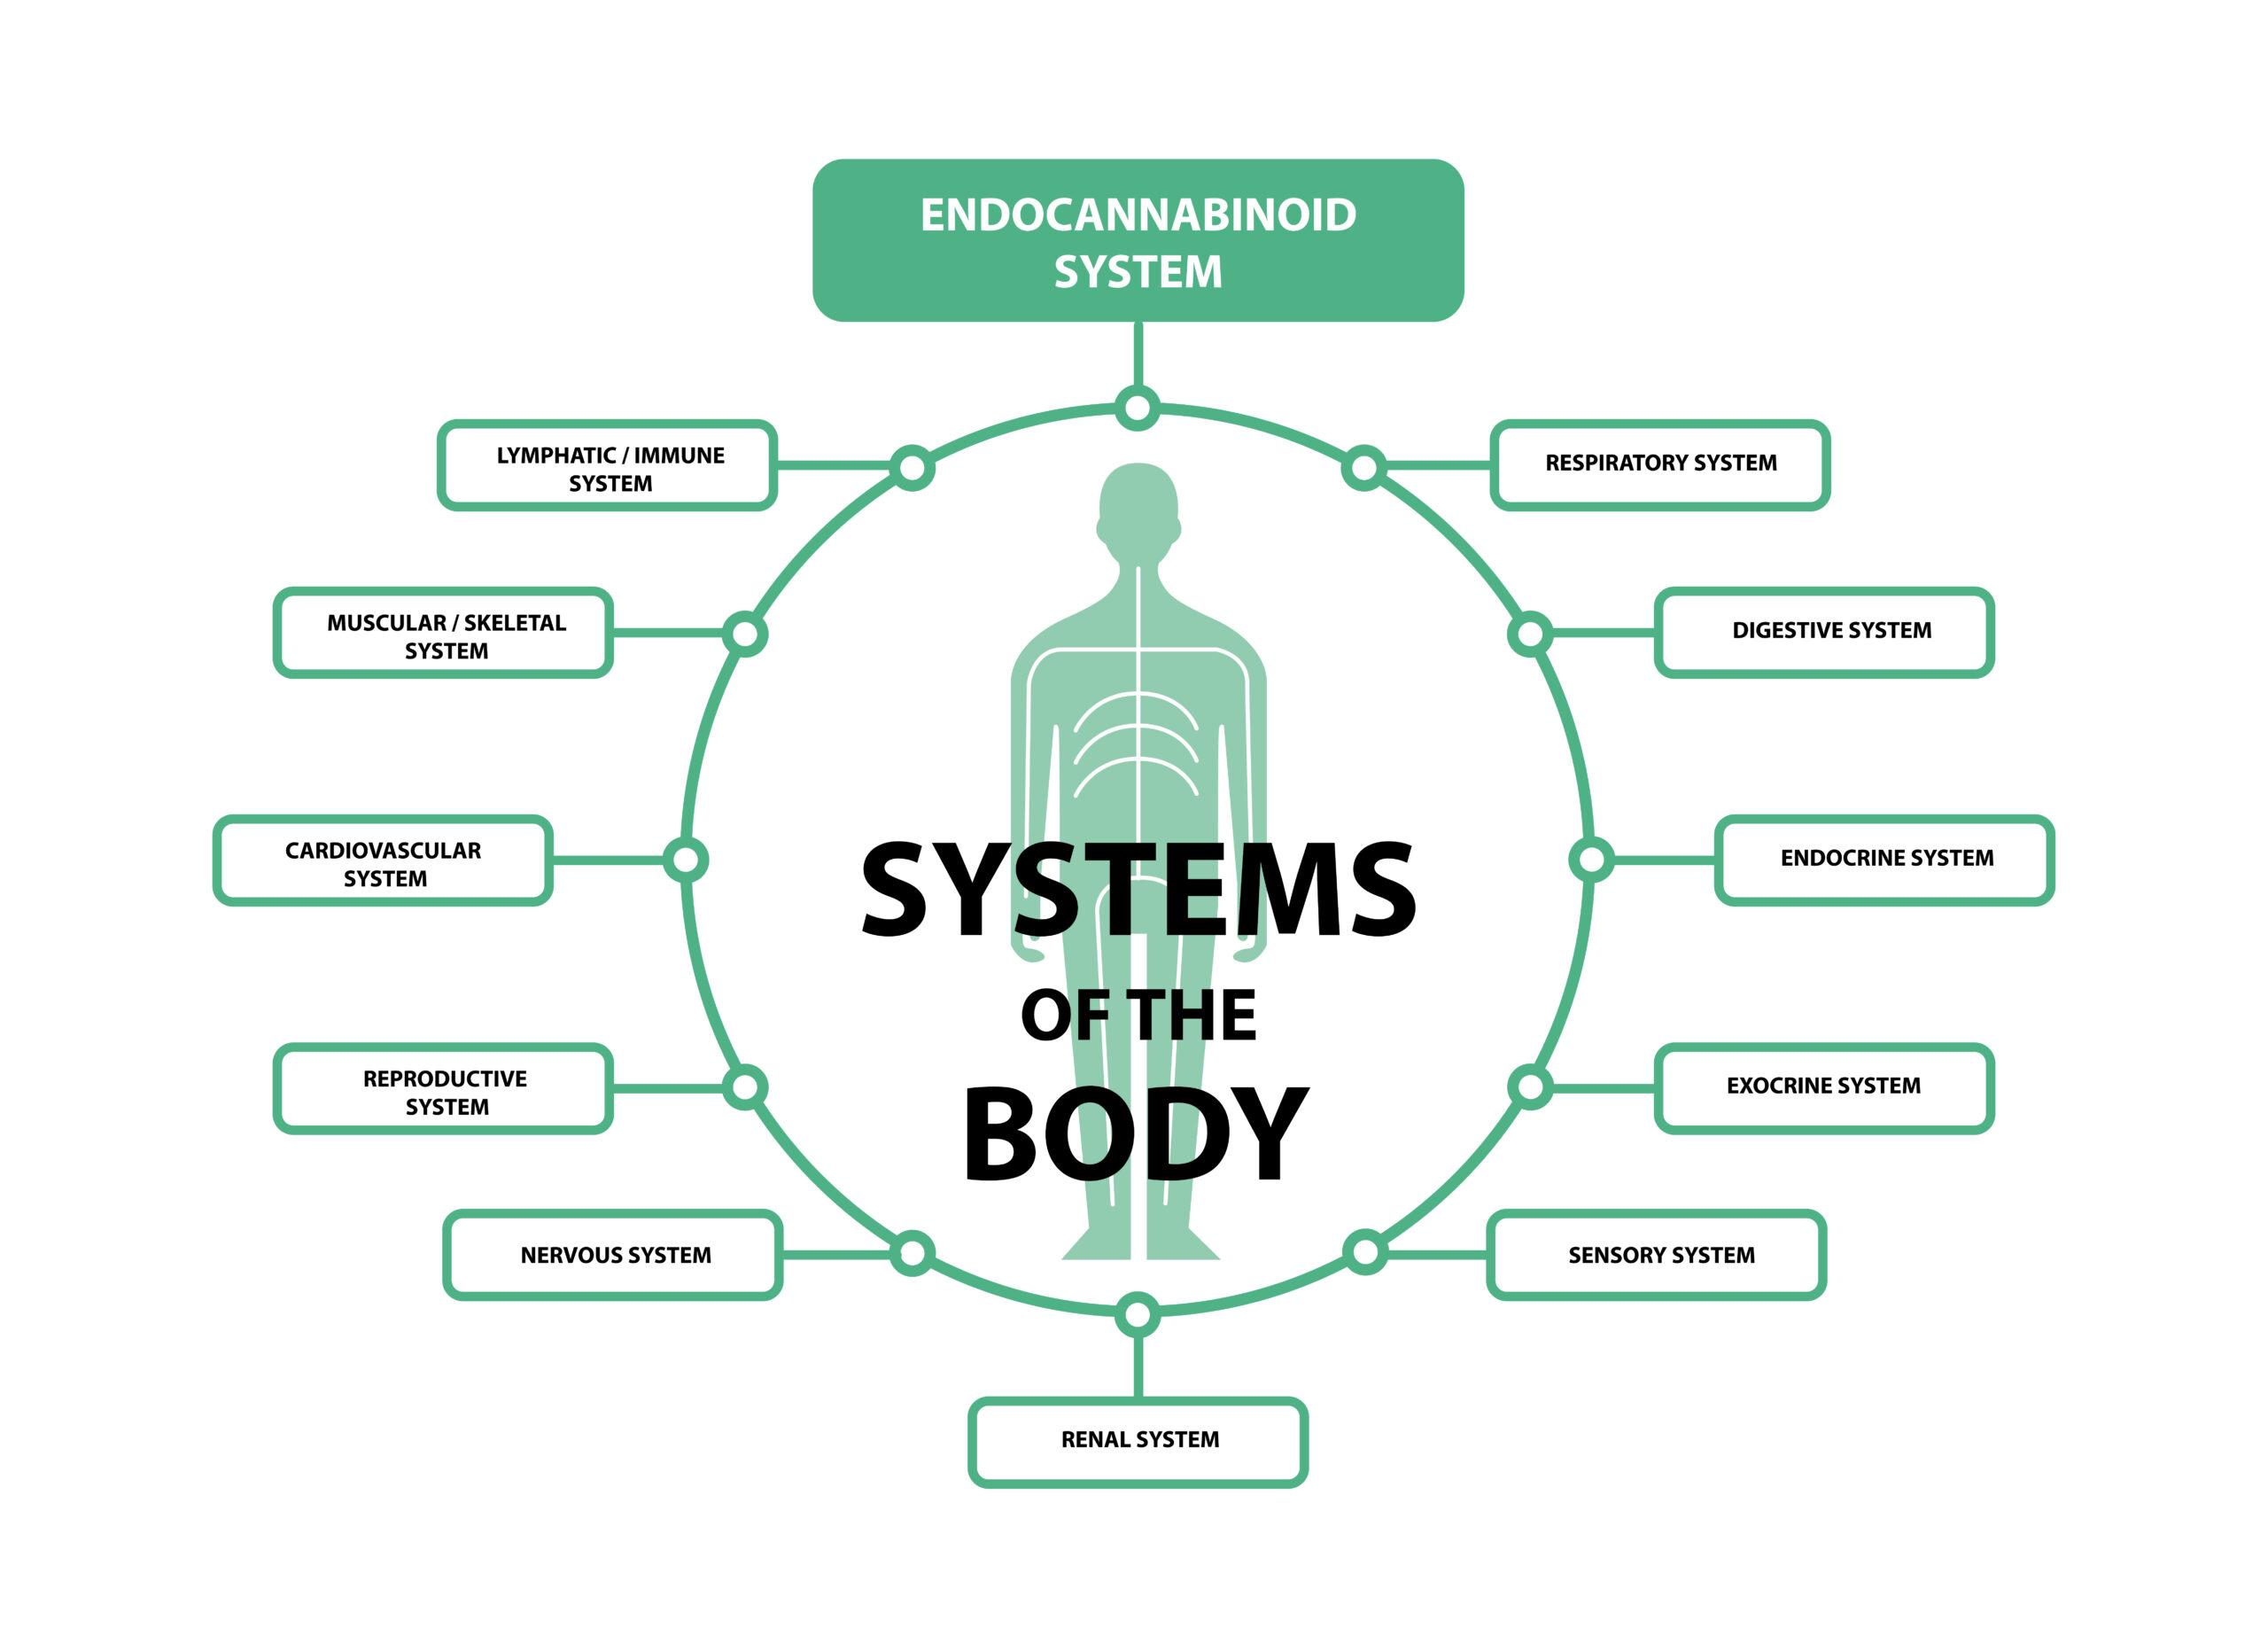 CannaGlobe endocannabinoid system